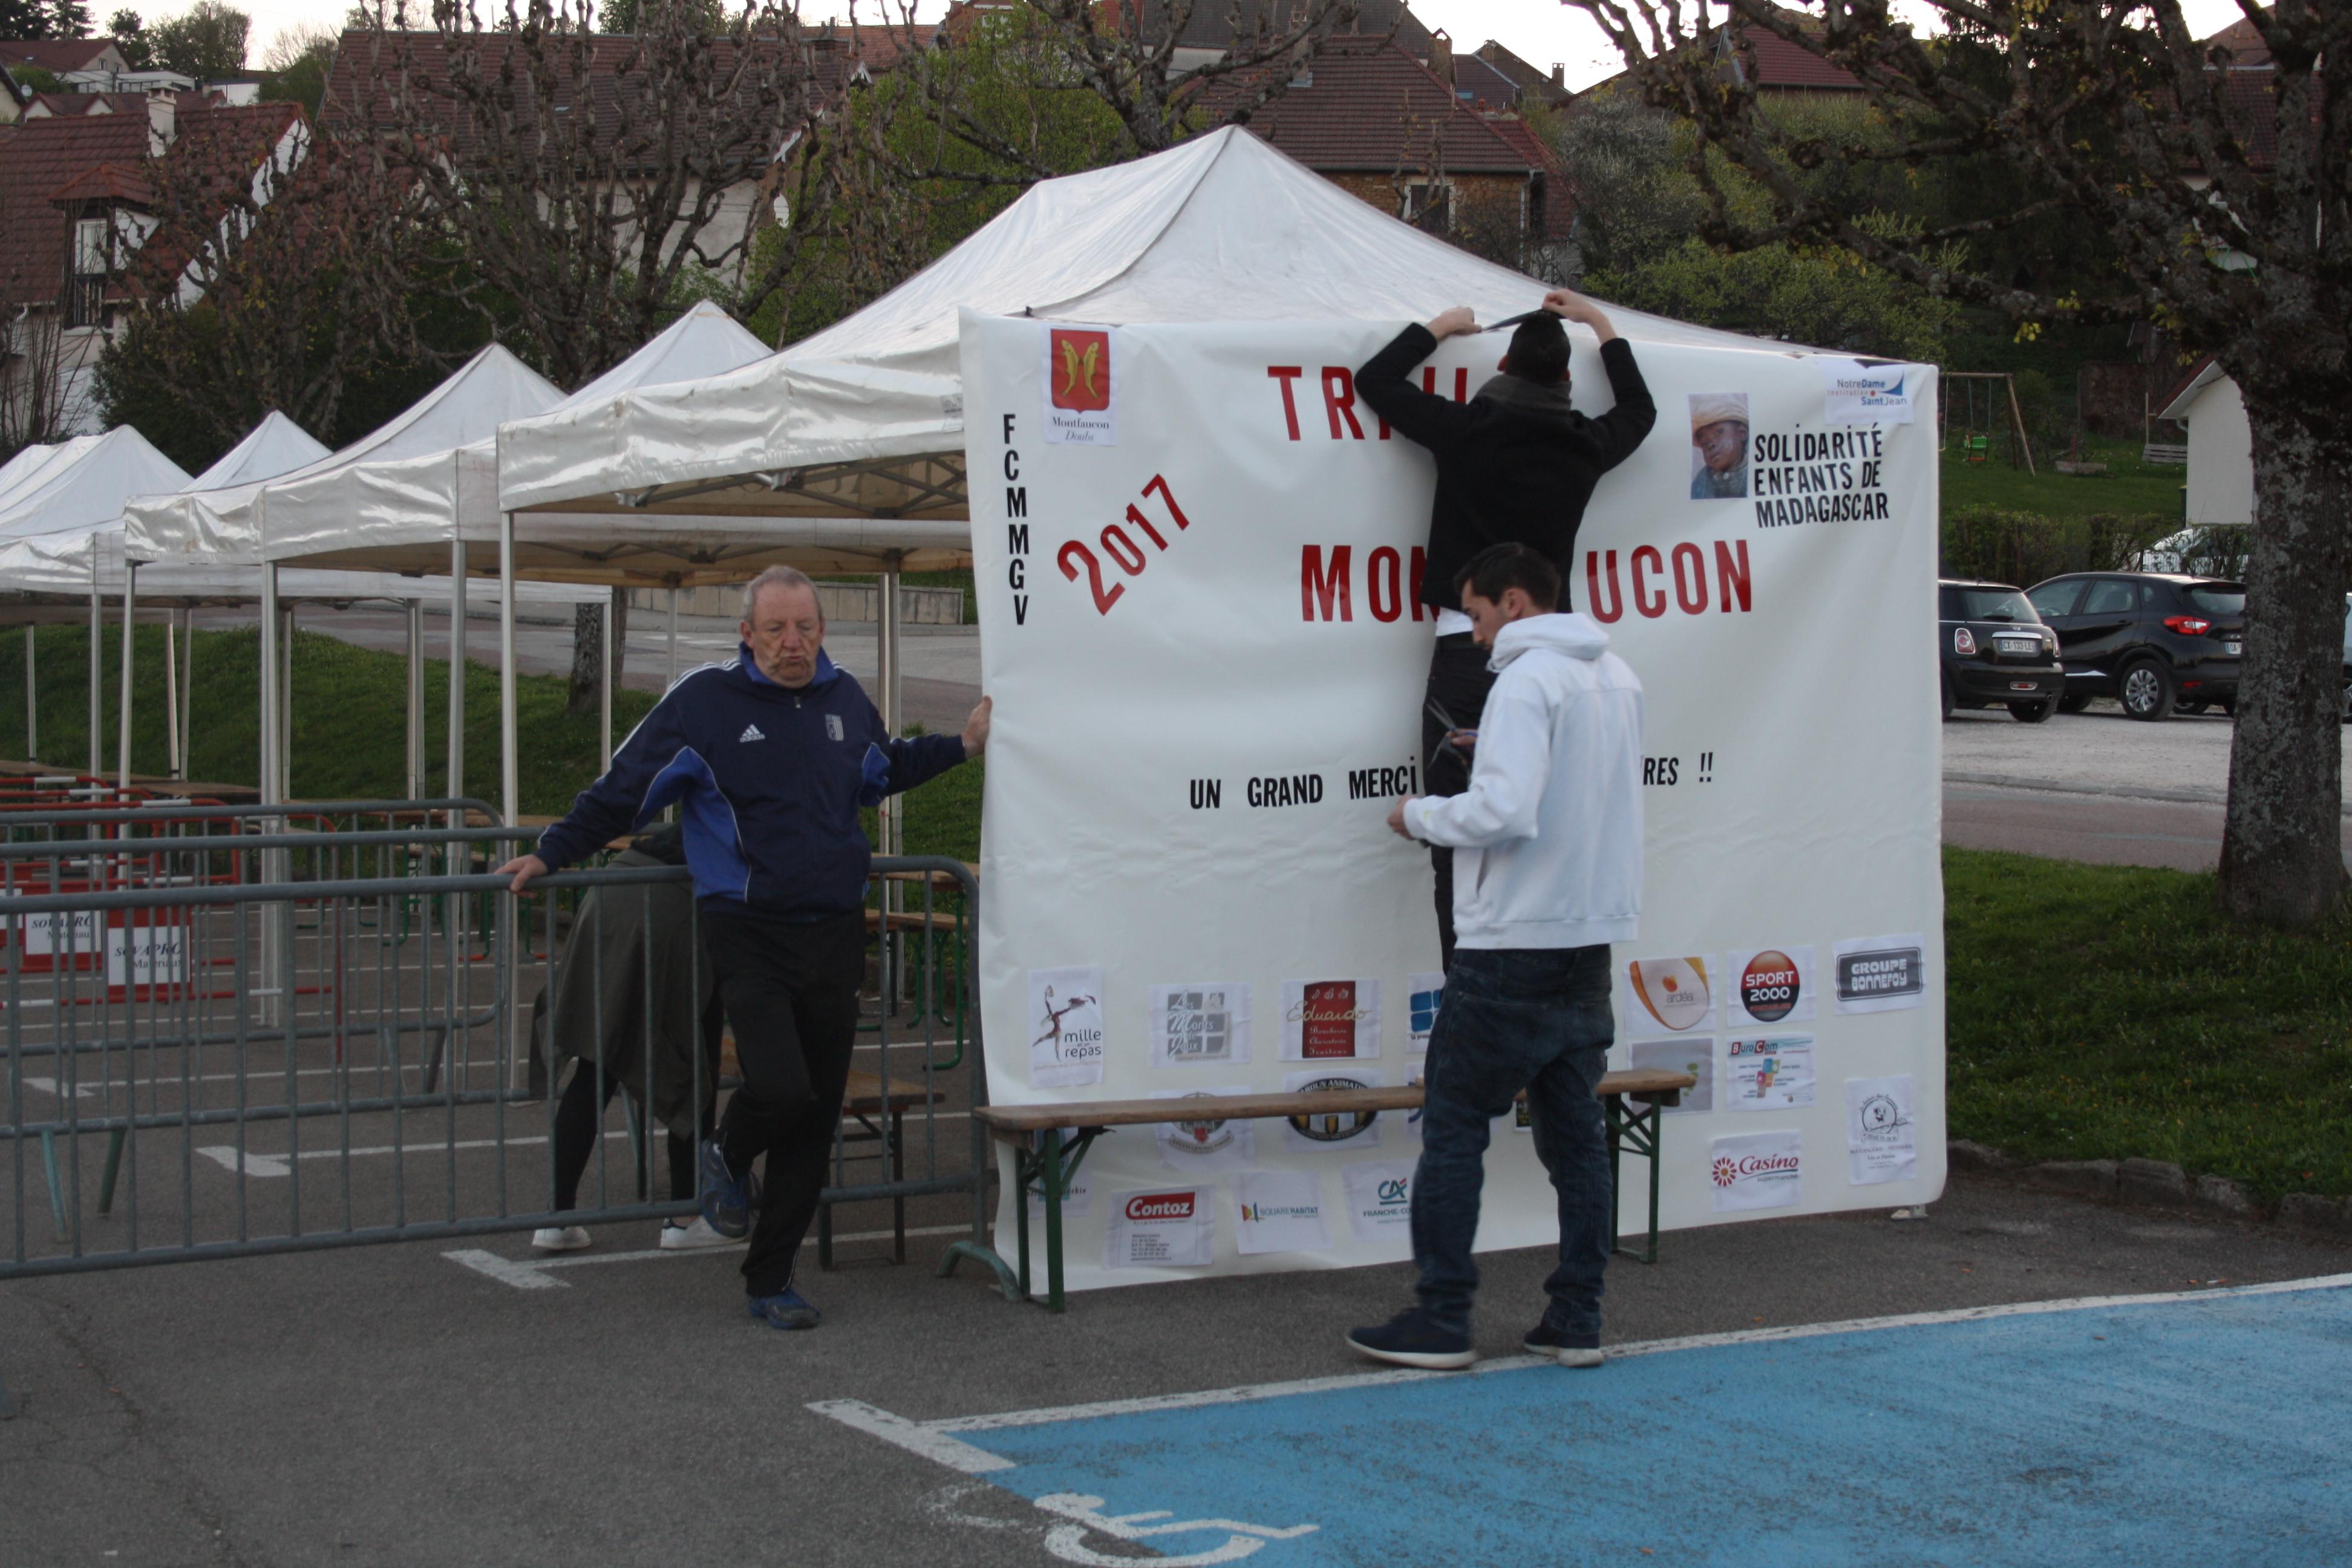 2017-04-09 - Trail-Montfaucon (9)